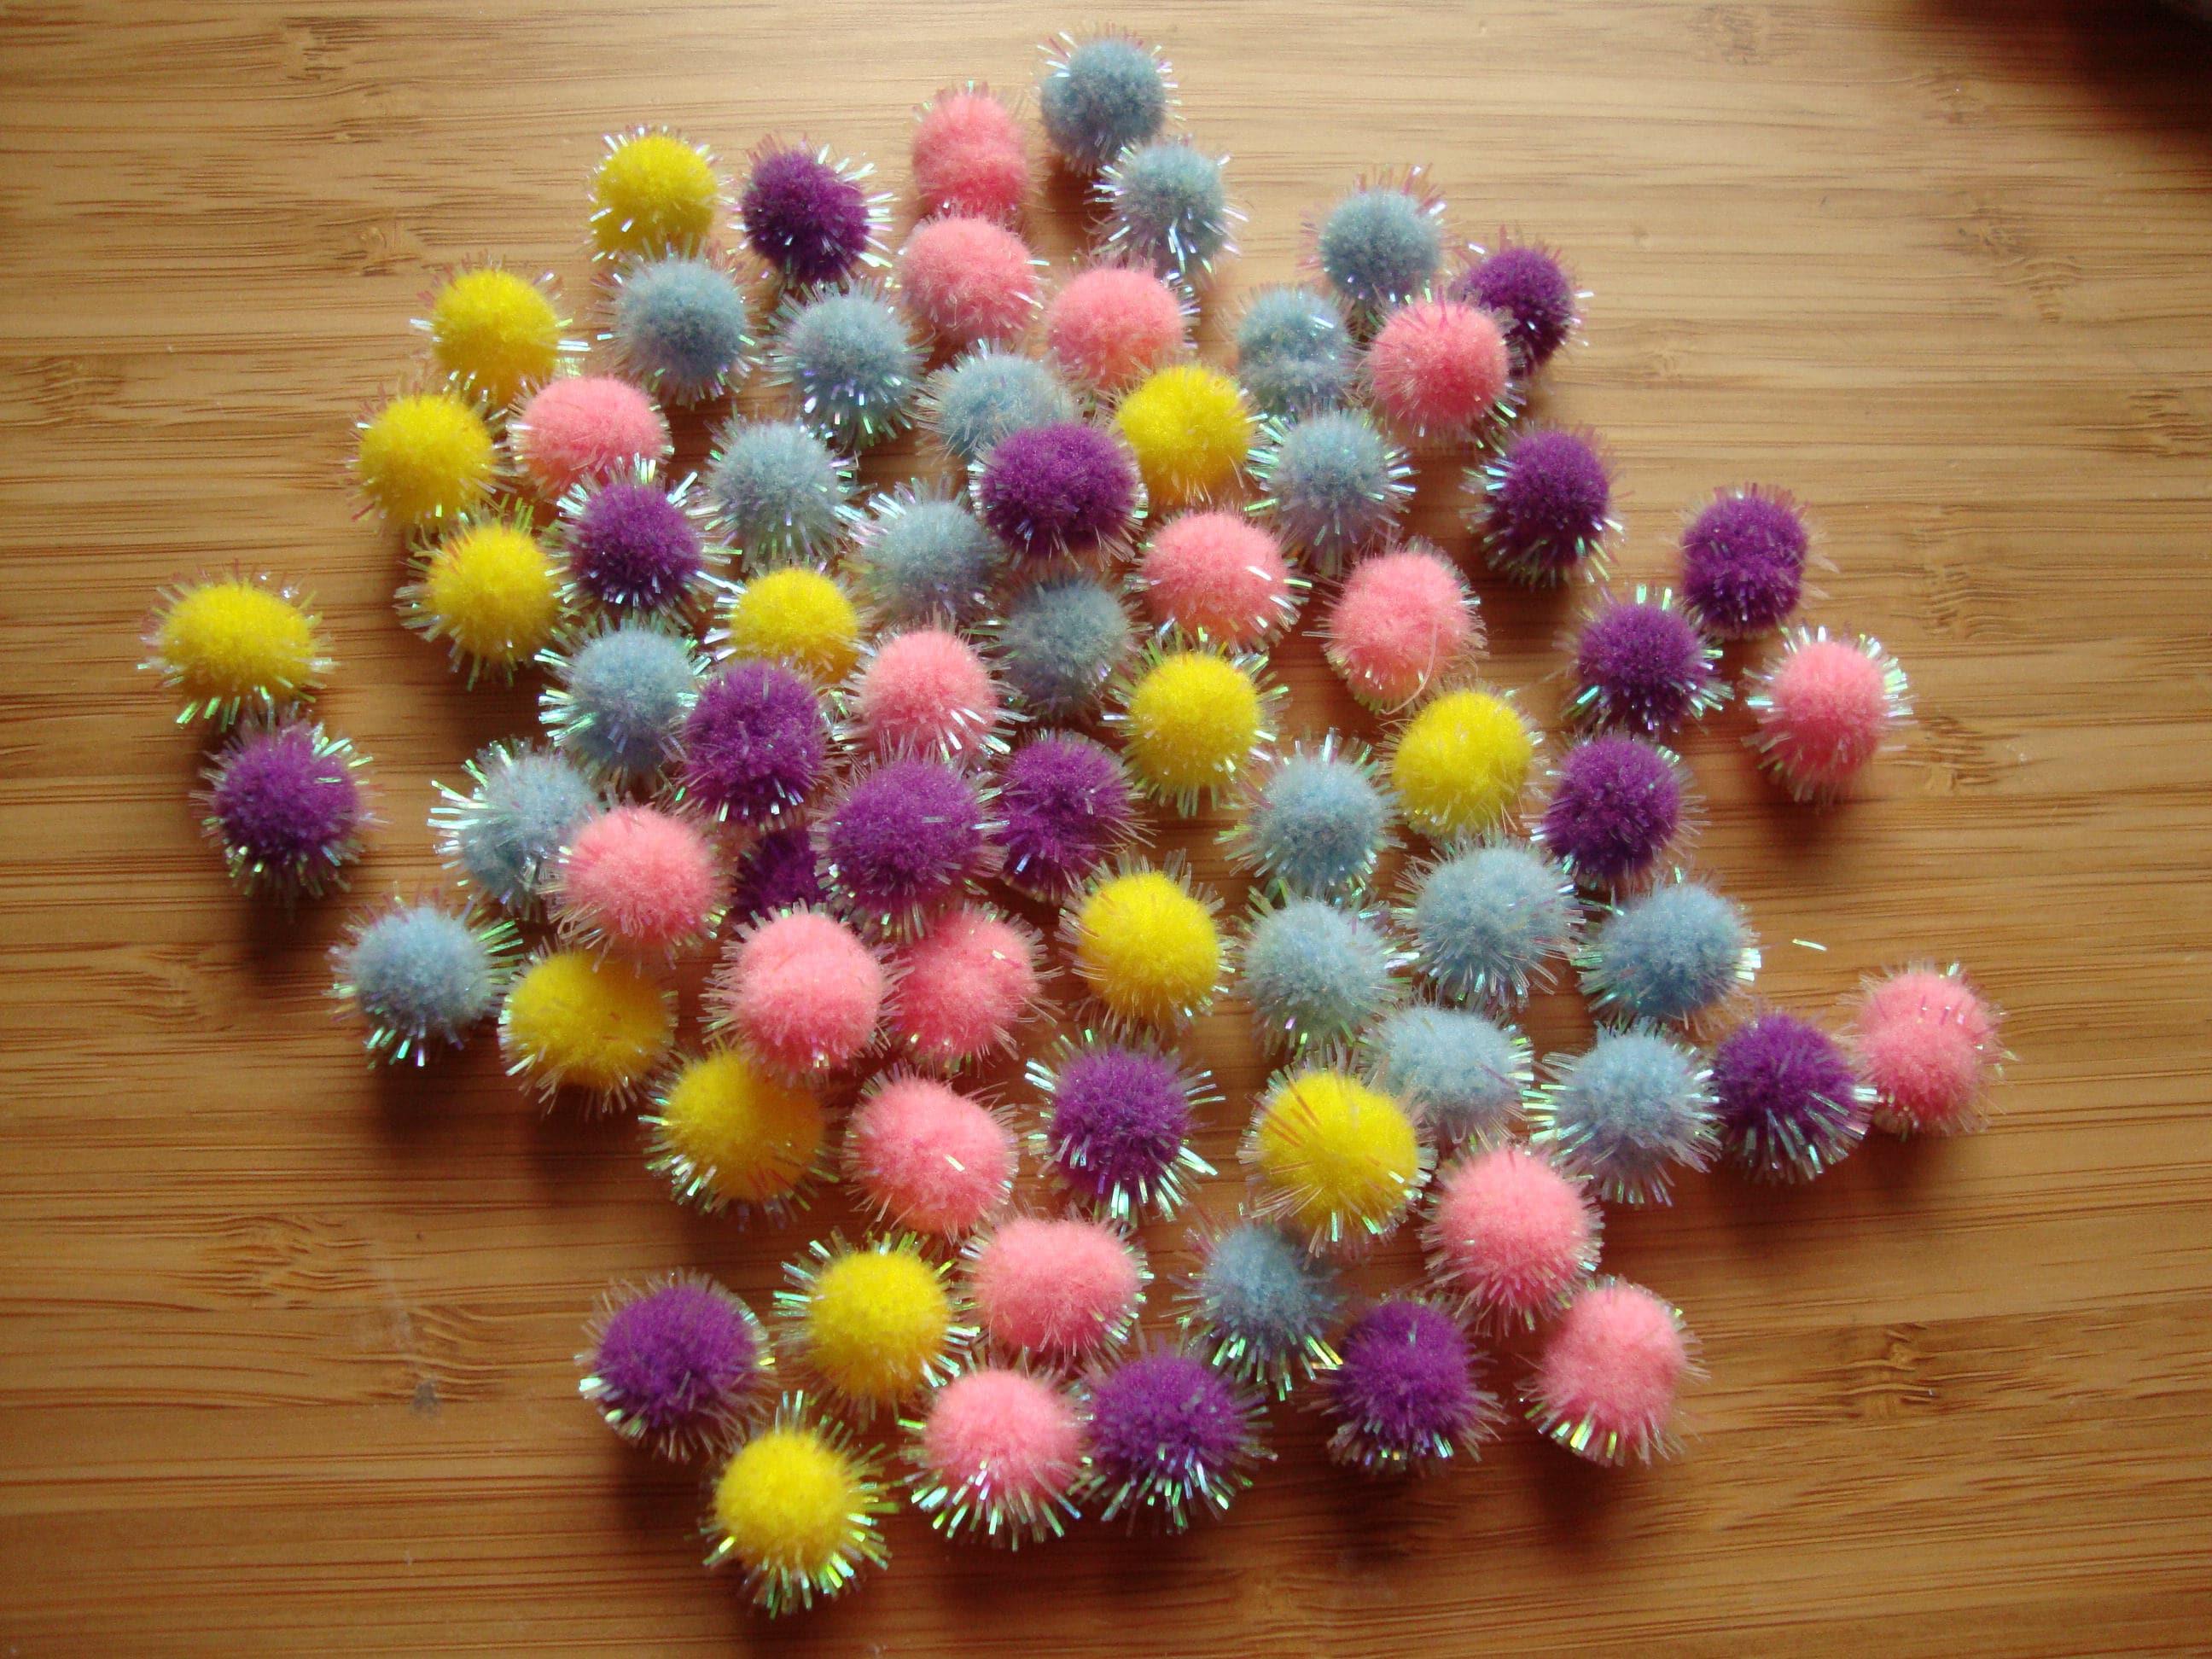 Mini Pom Poms For Spring Easter Embellishments Bunny Tails Etsy